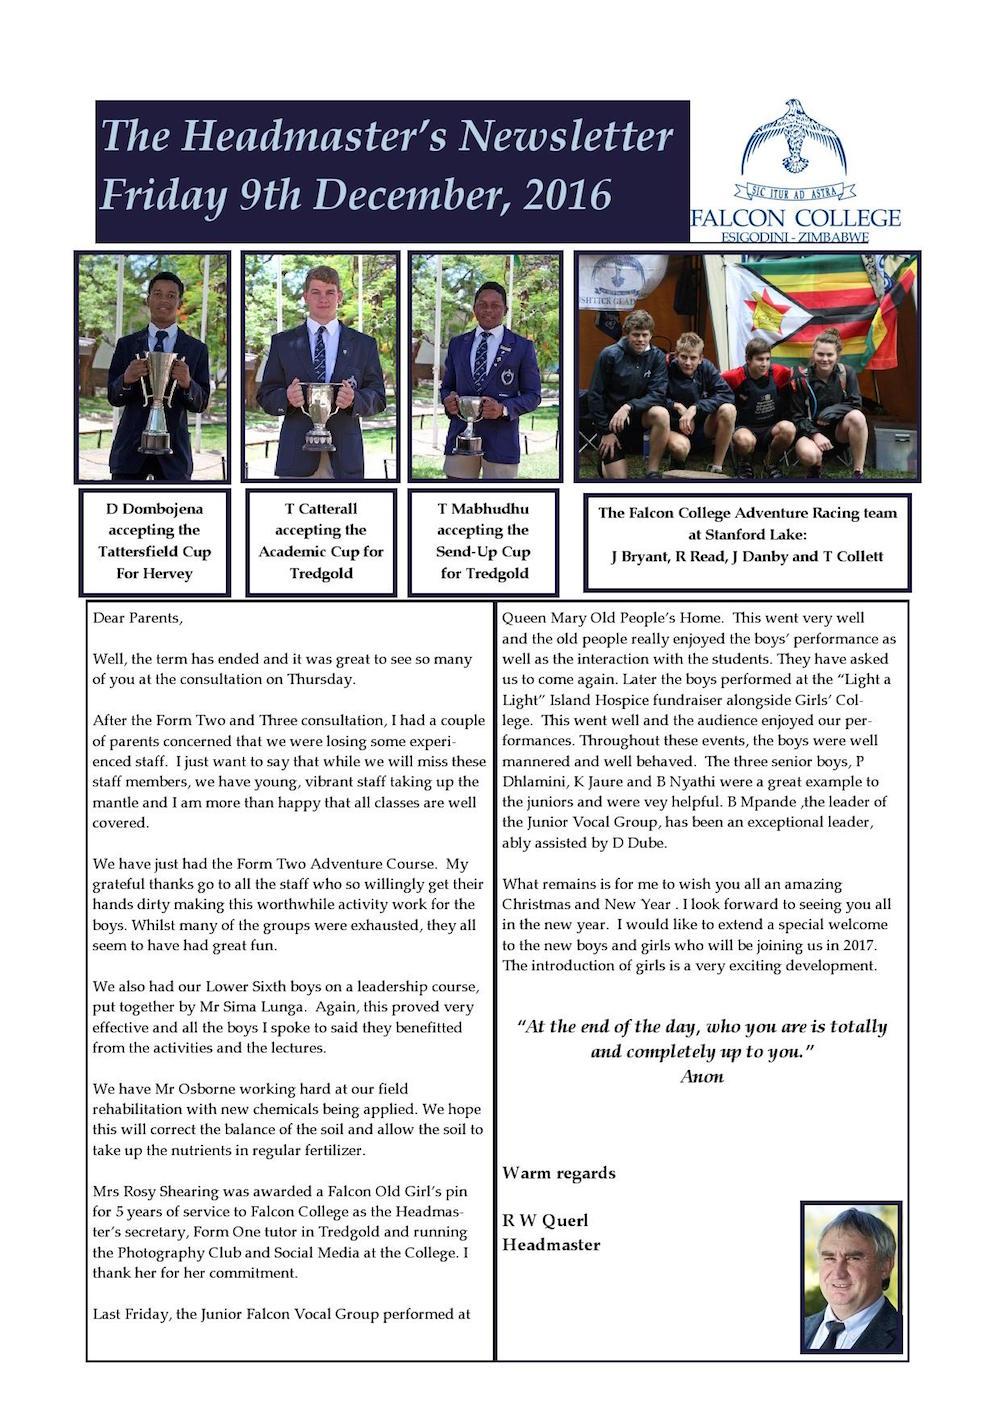 headmasters-newsletter-fri-9th-december-2016-edited_000001